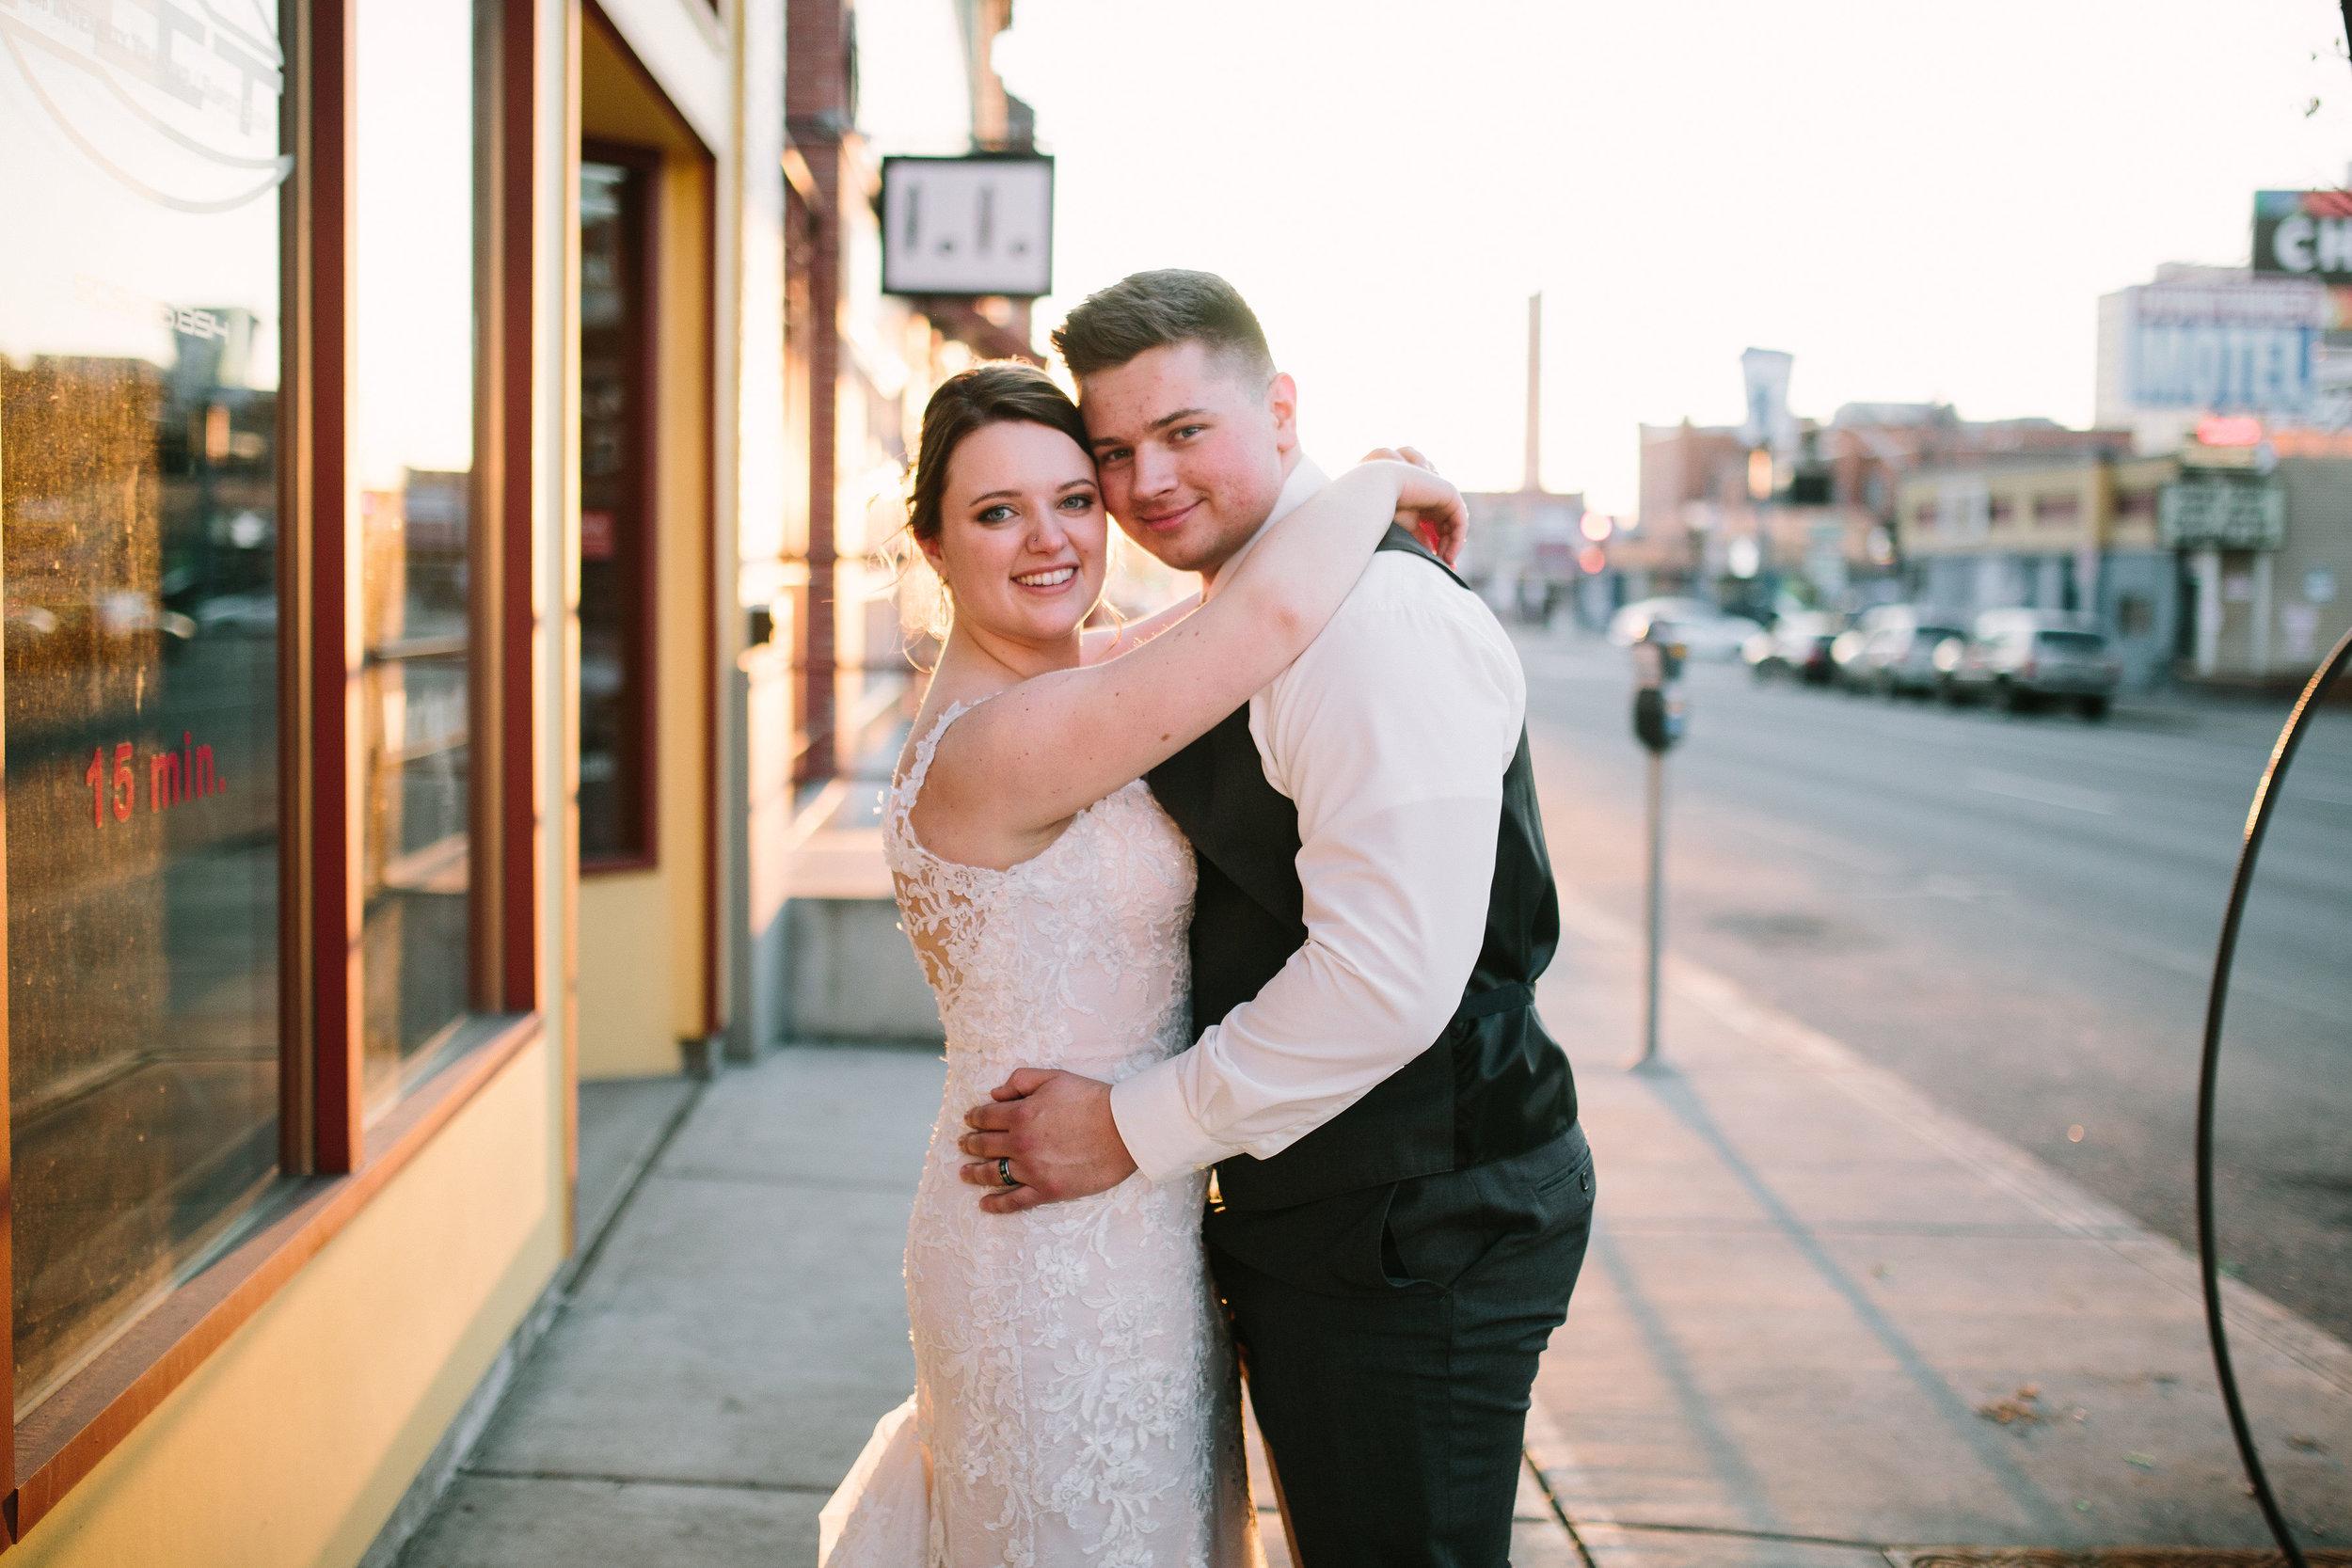 Fun Rustic spokane wedding portrait couple wedding day cars